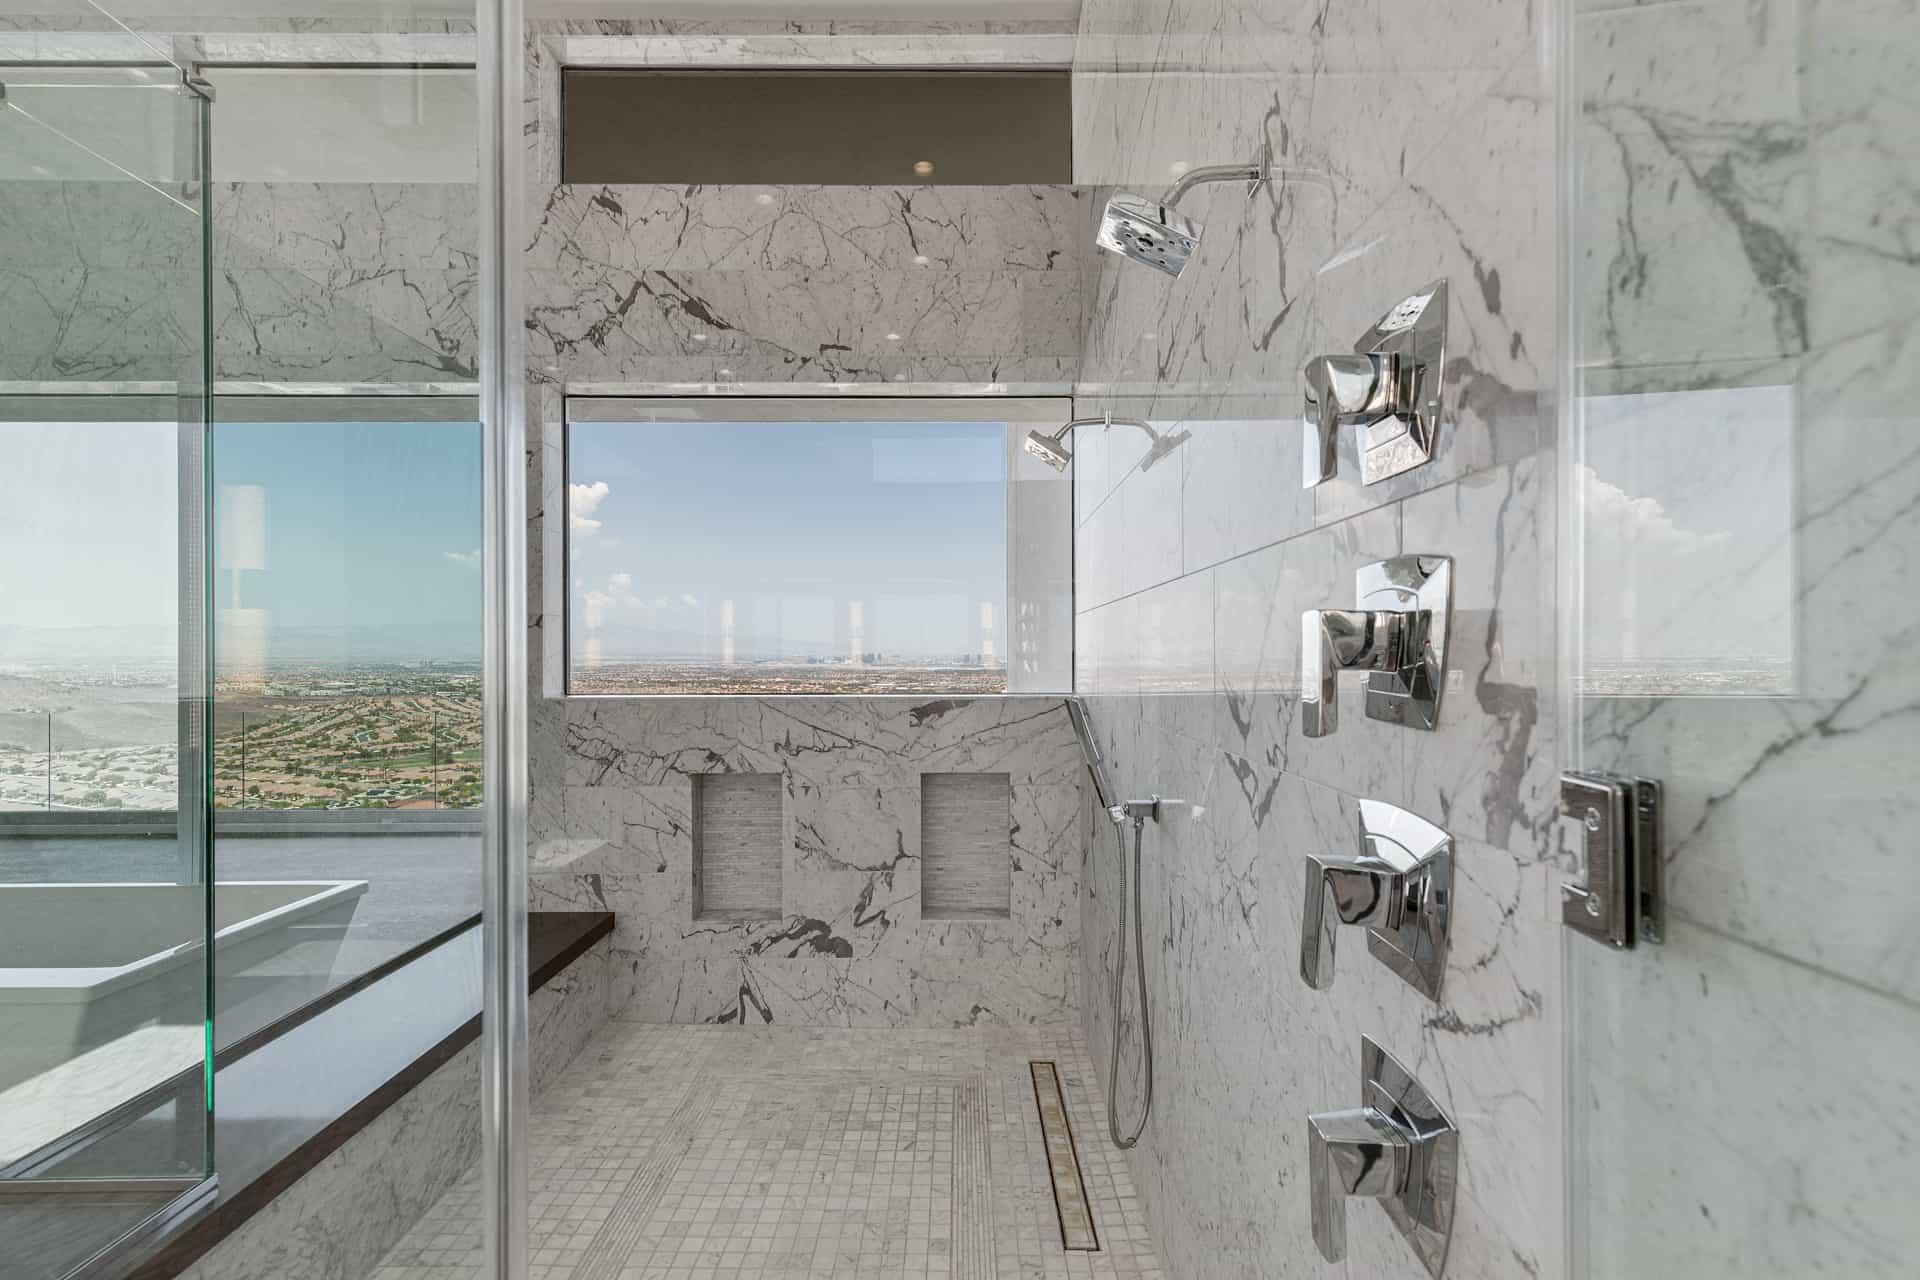 las-vegas-luxry-real-estate-realtor-rob-jensen-company-5-rockstream-drive-ascaya067